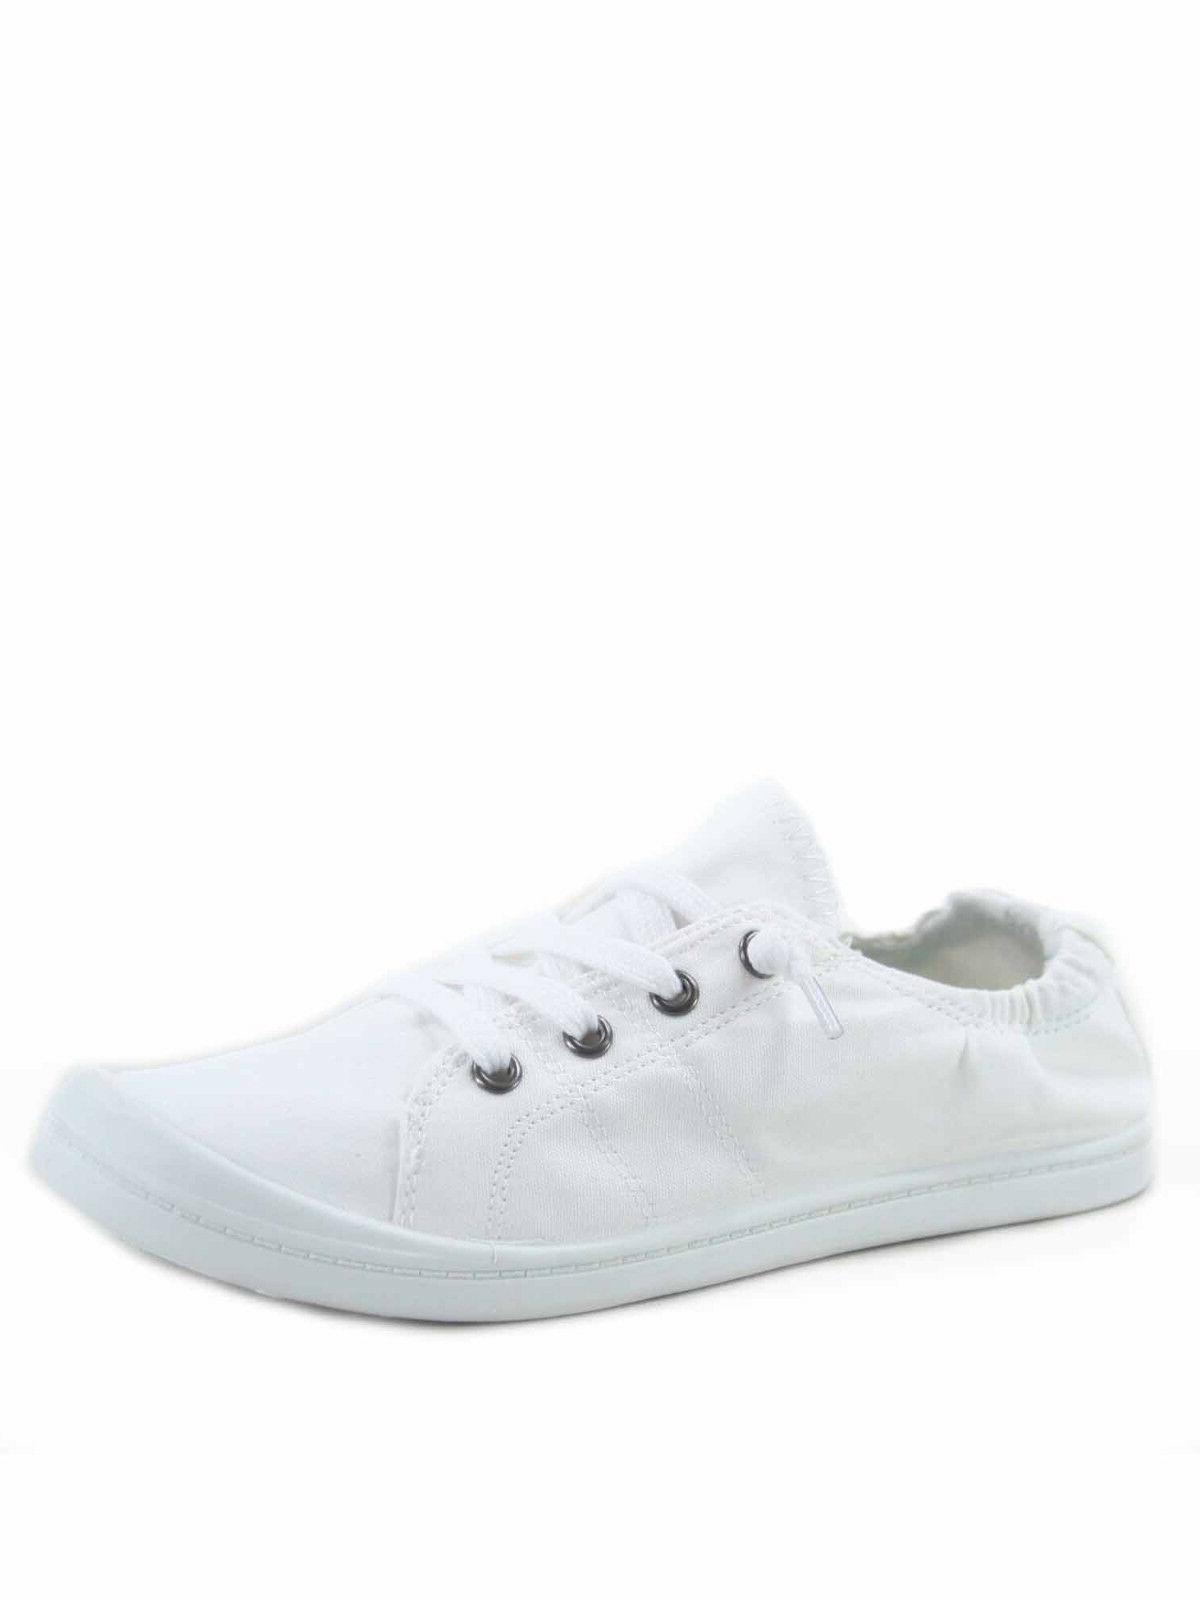 Women's Causal Slip Flat Heel Sneaker All 5.5 11 NEW